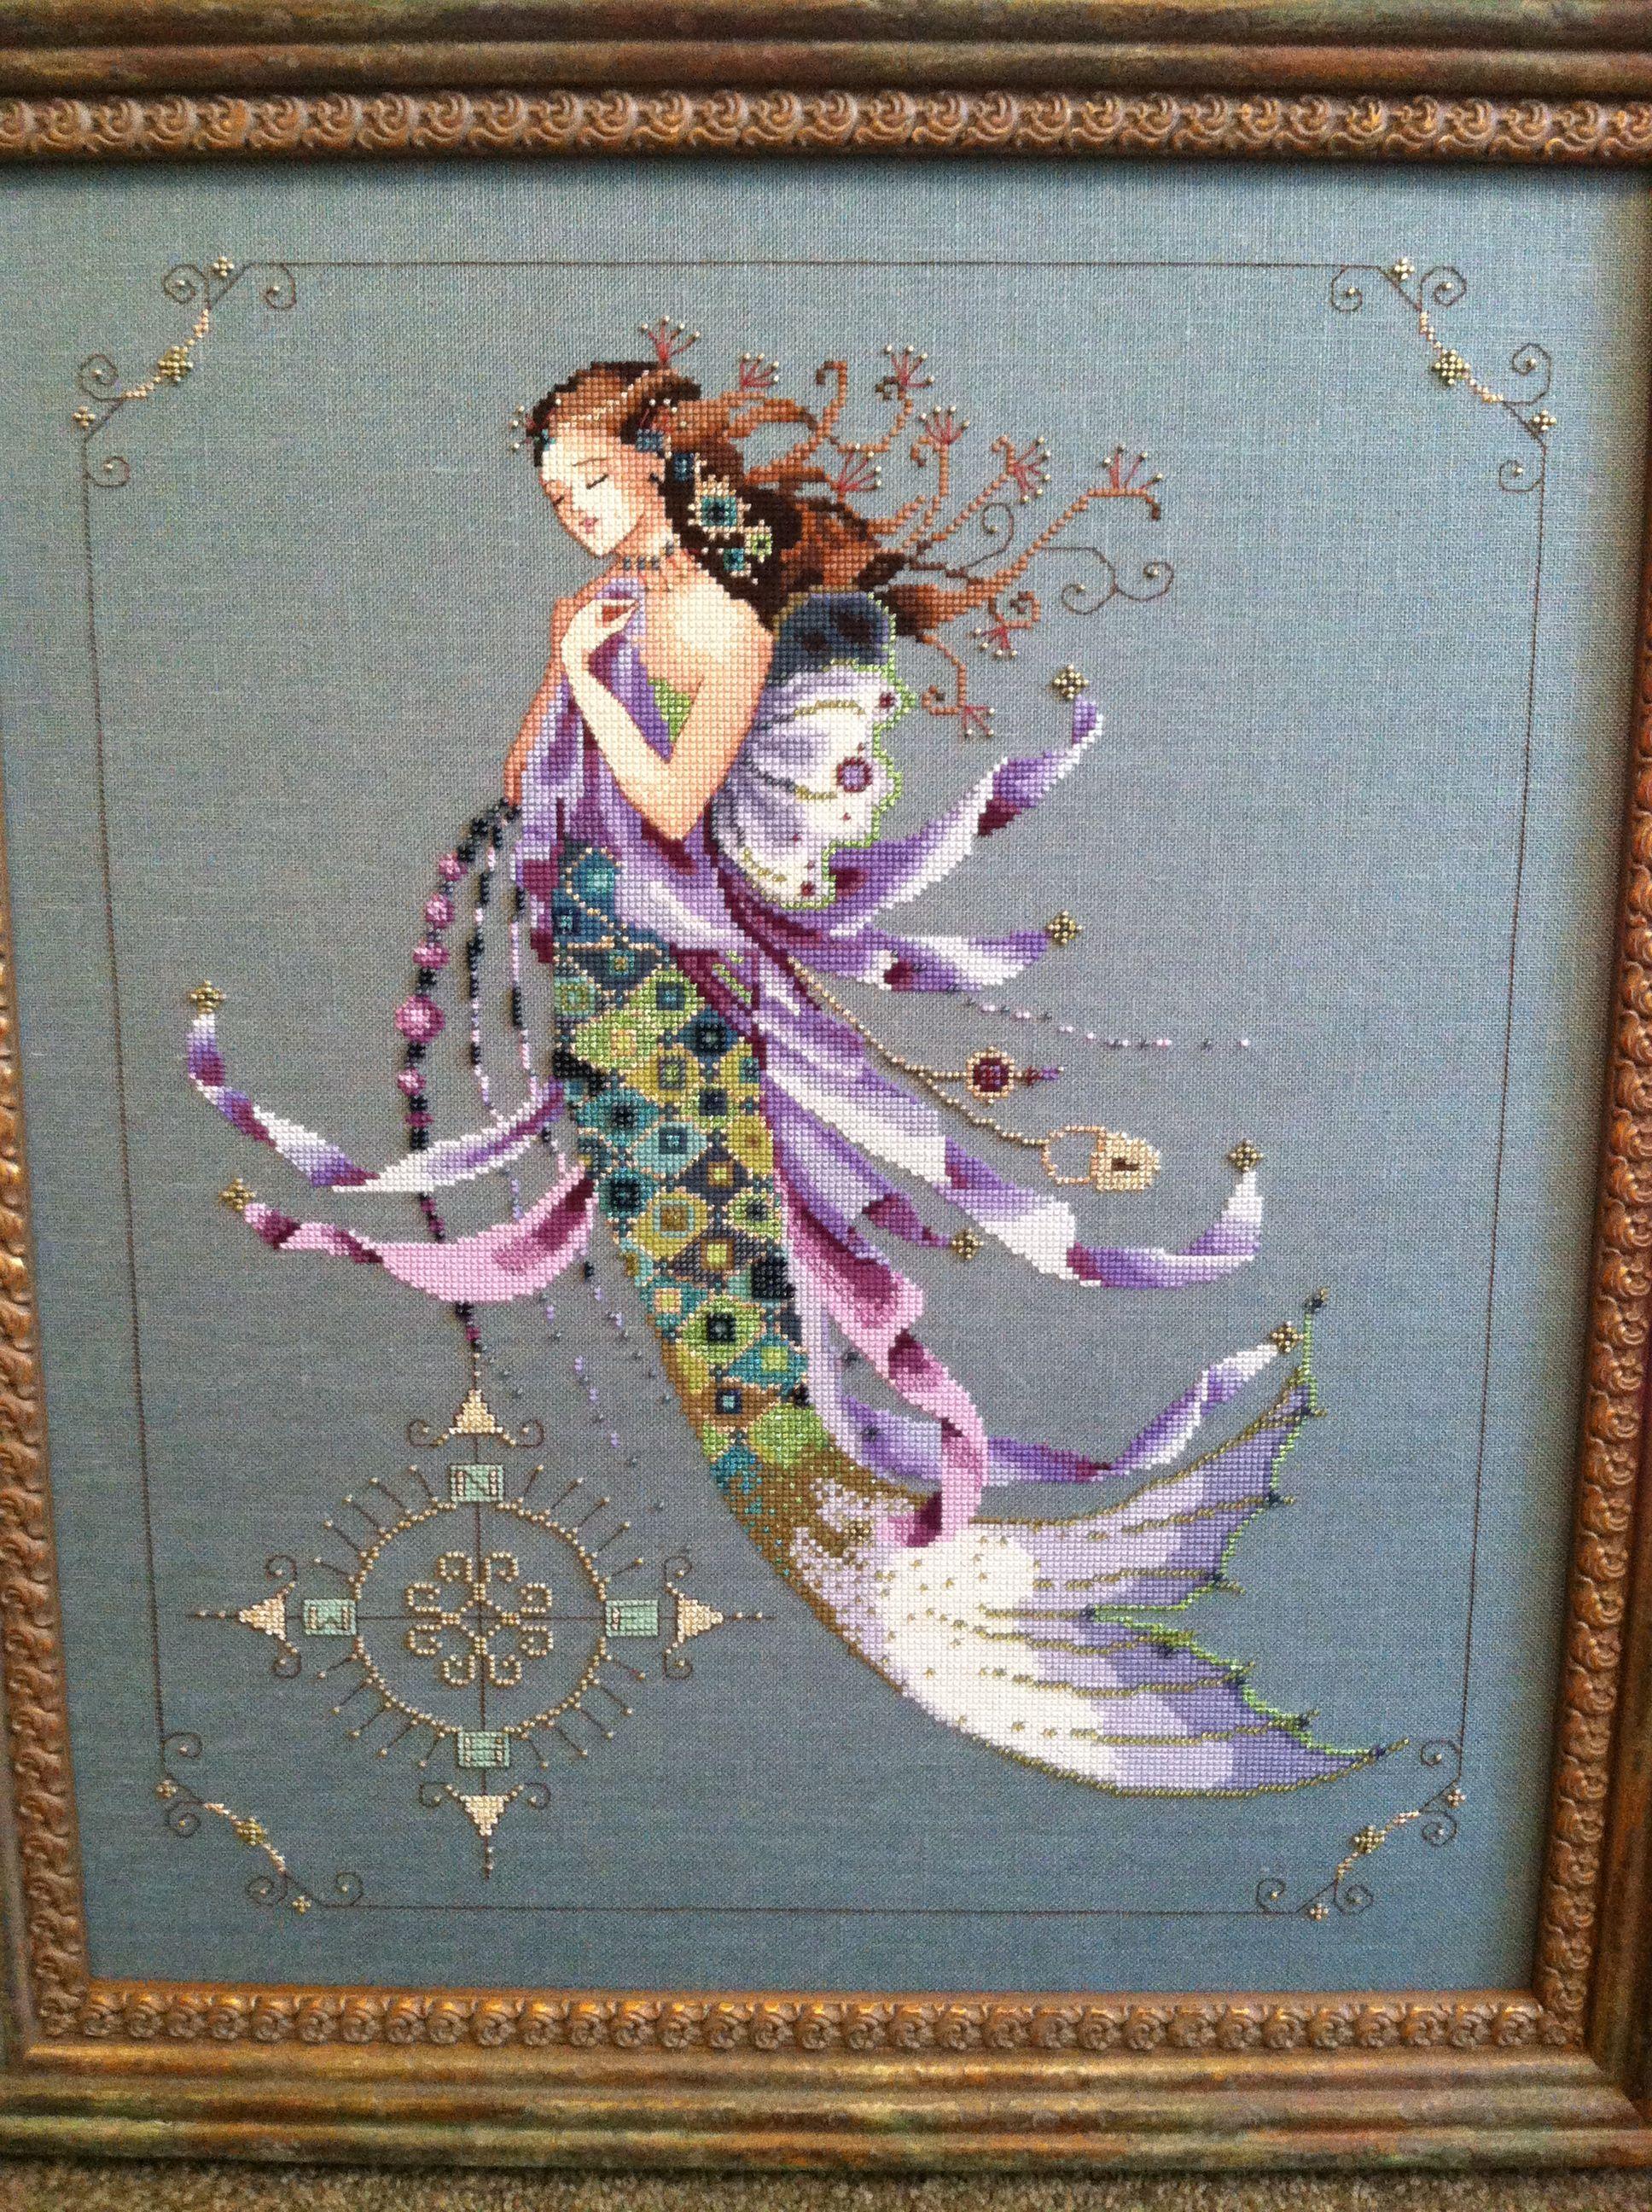 Shimmering Mermaid Cross Stitch Chart Mirabilia Designs